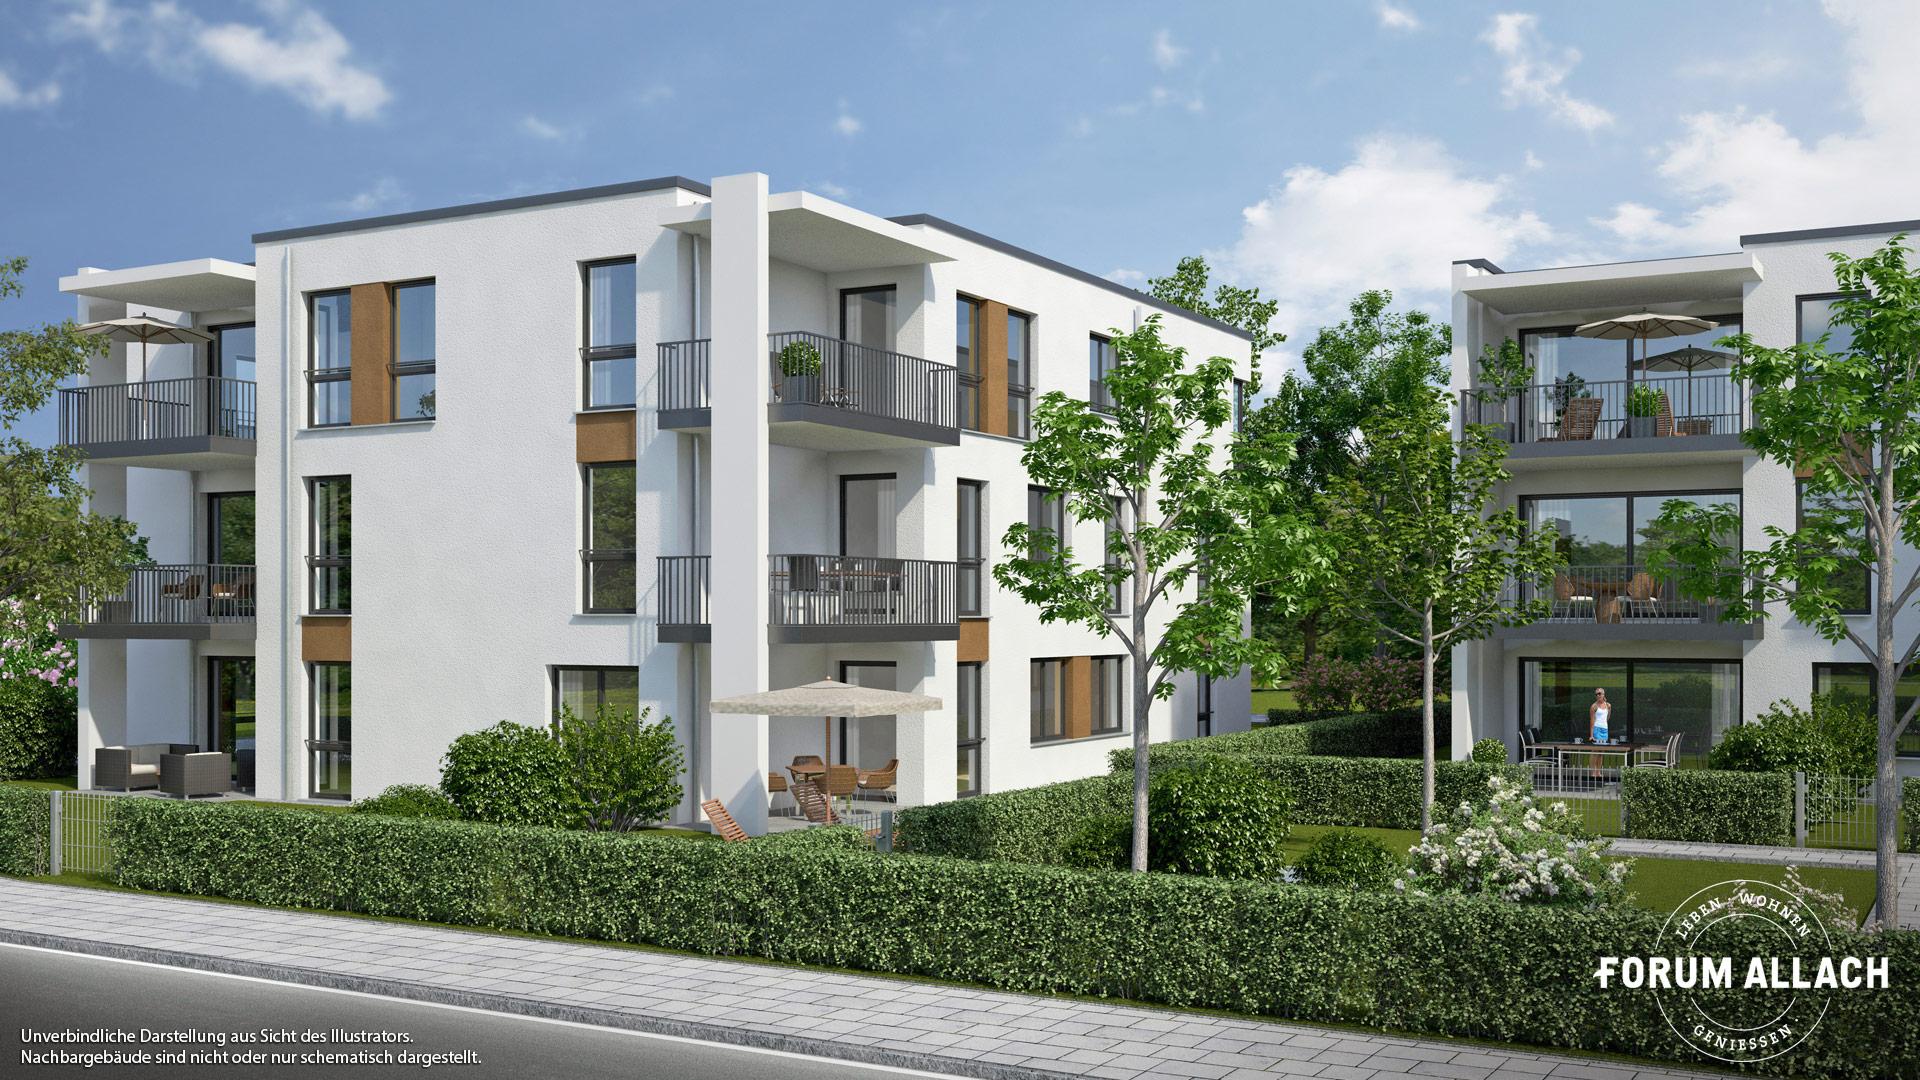 Immobilie Forum Allach - Illustration 2